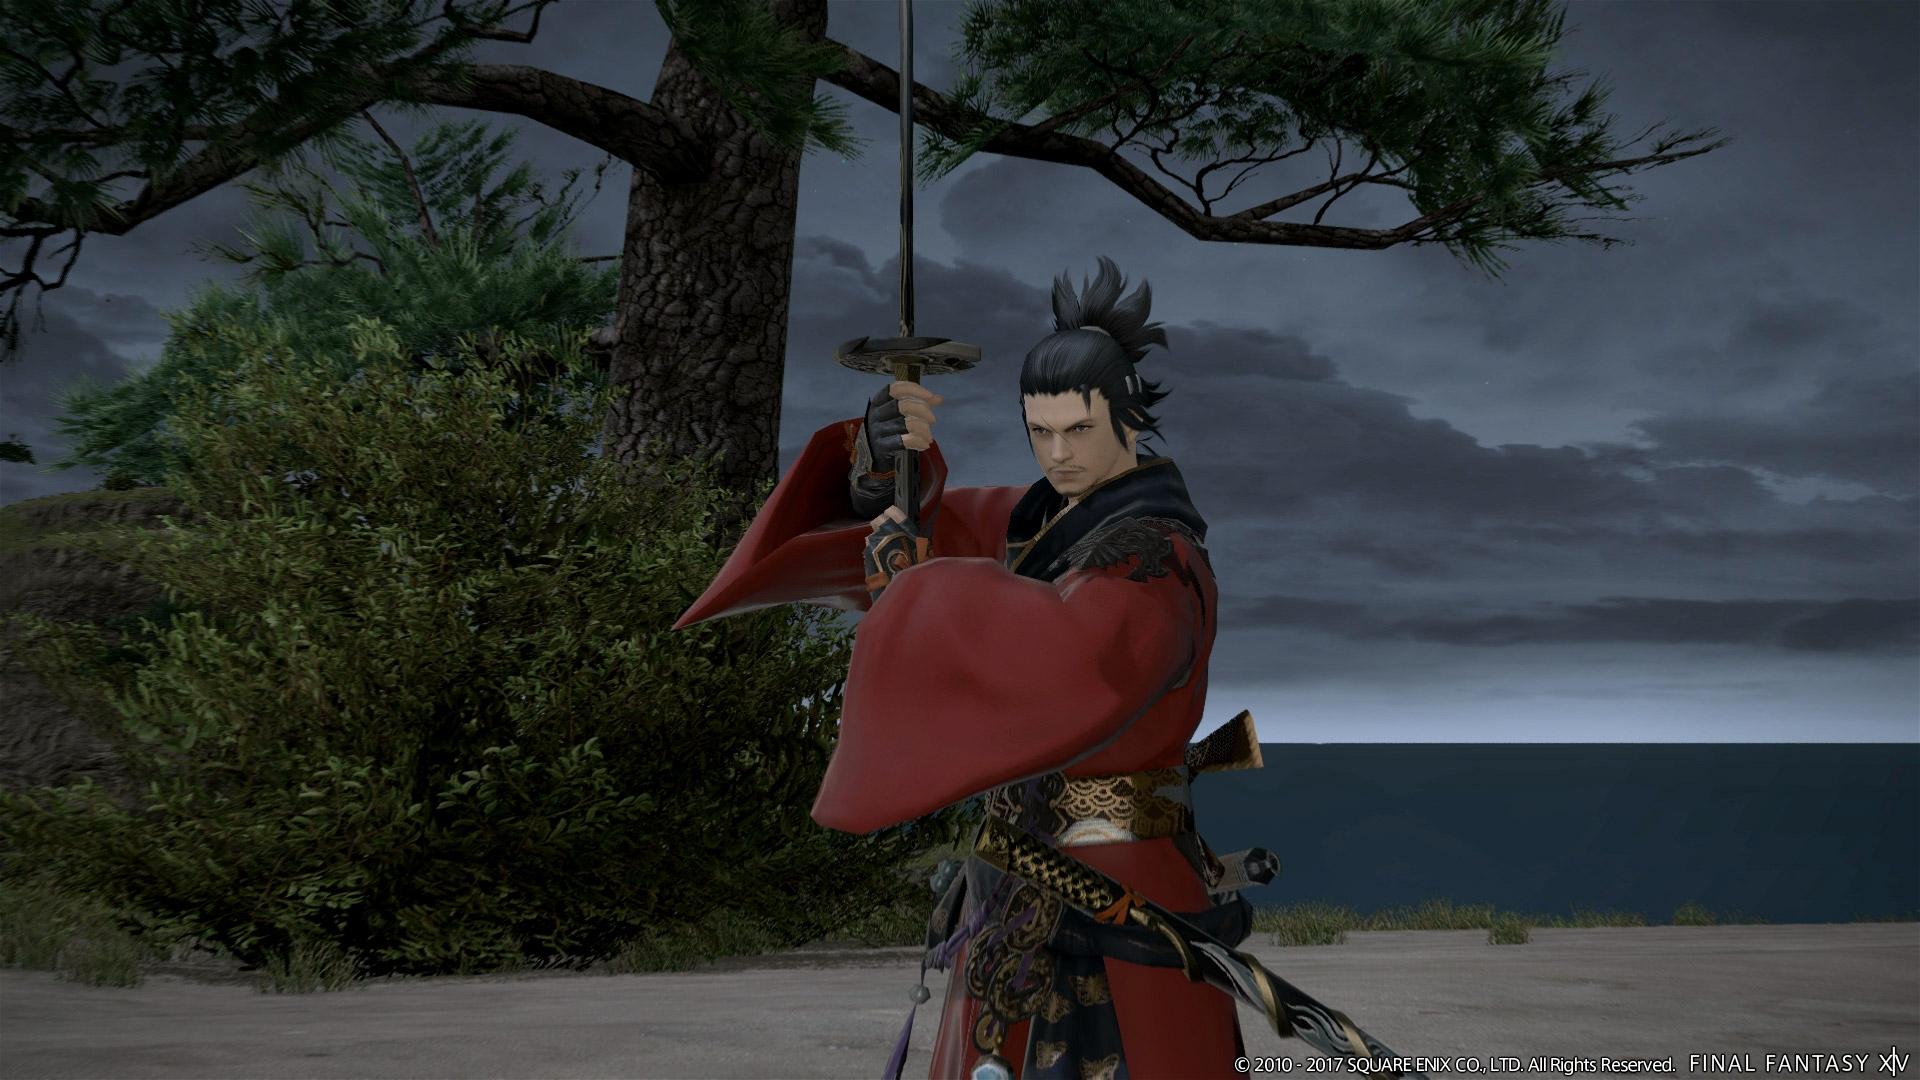 A samurai from Final Fantasy 14